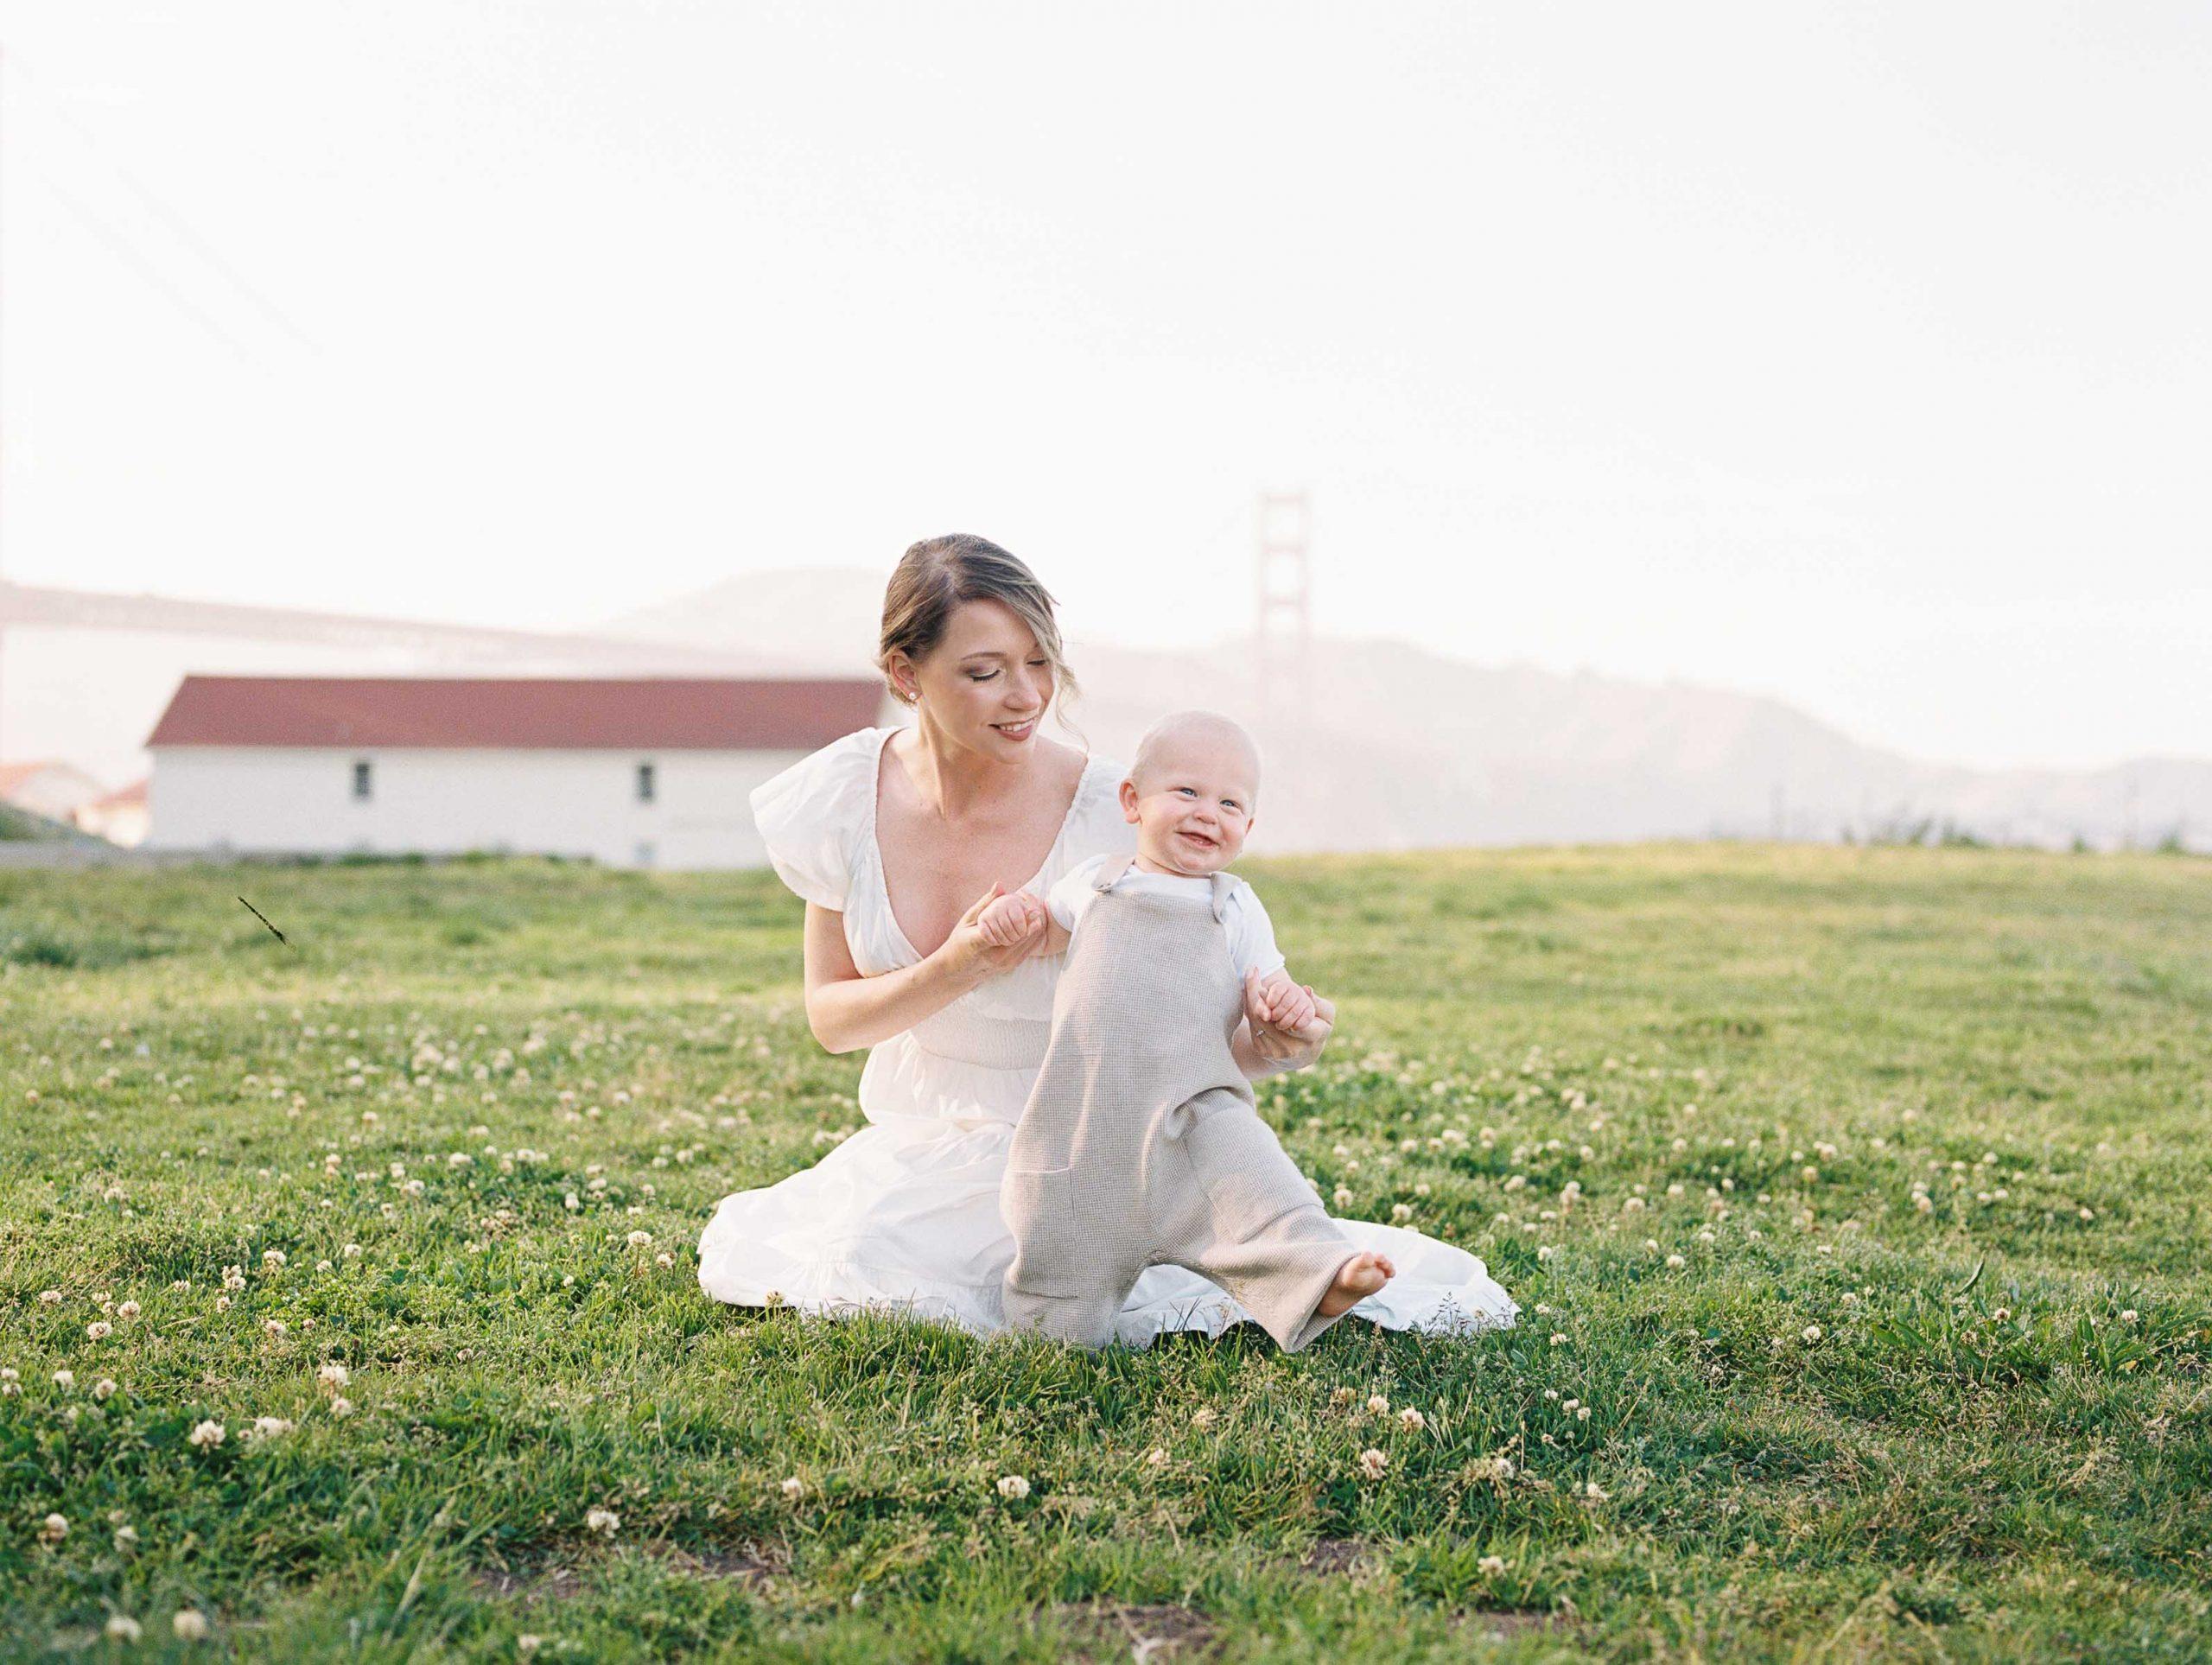 crissy field motherhood photos